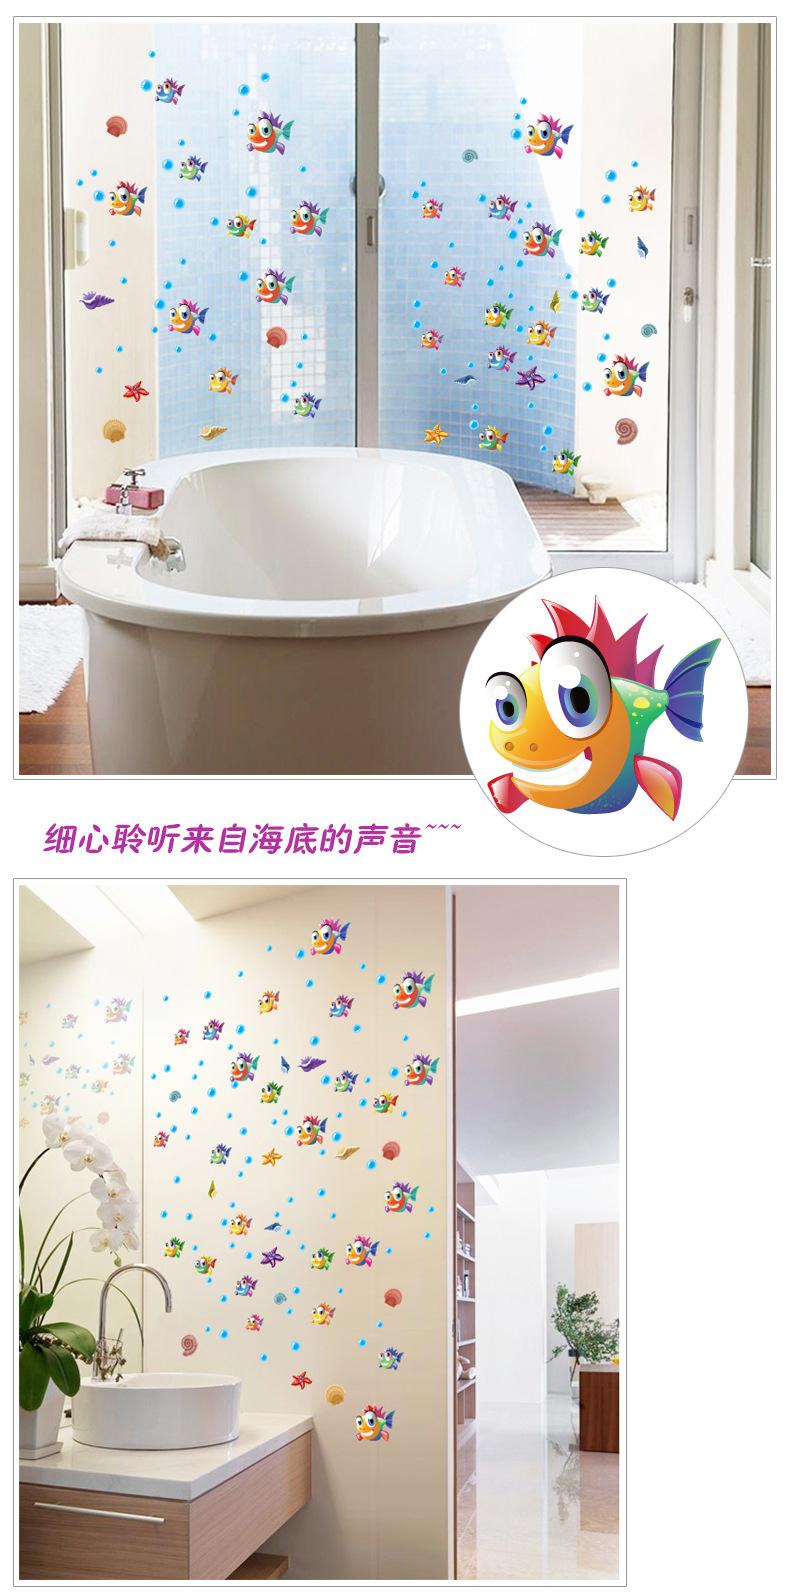 Factory wall stickers wholesale cartoon cartoon bubble bath bathroom glass door wash basin decoration stickers